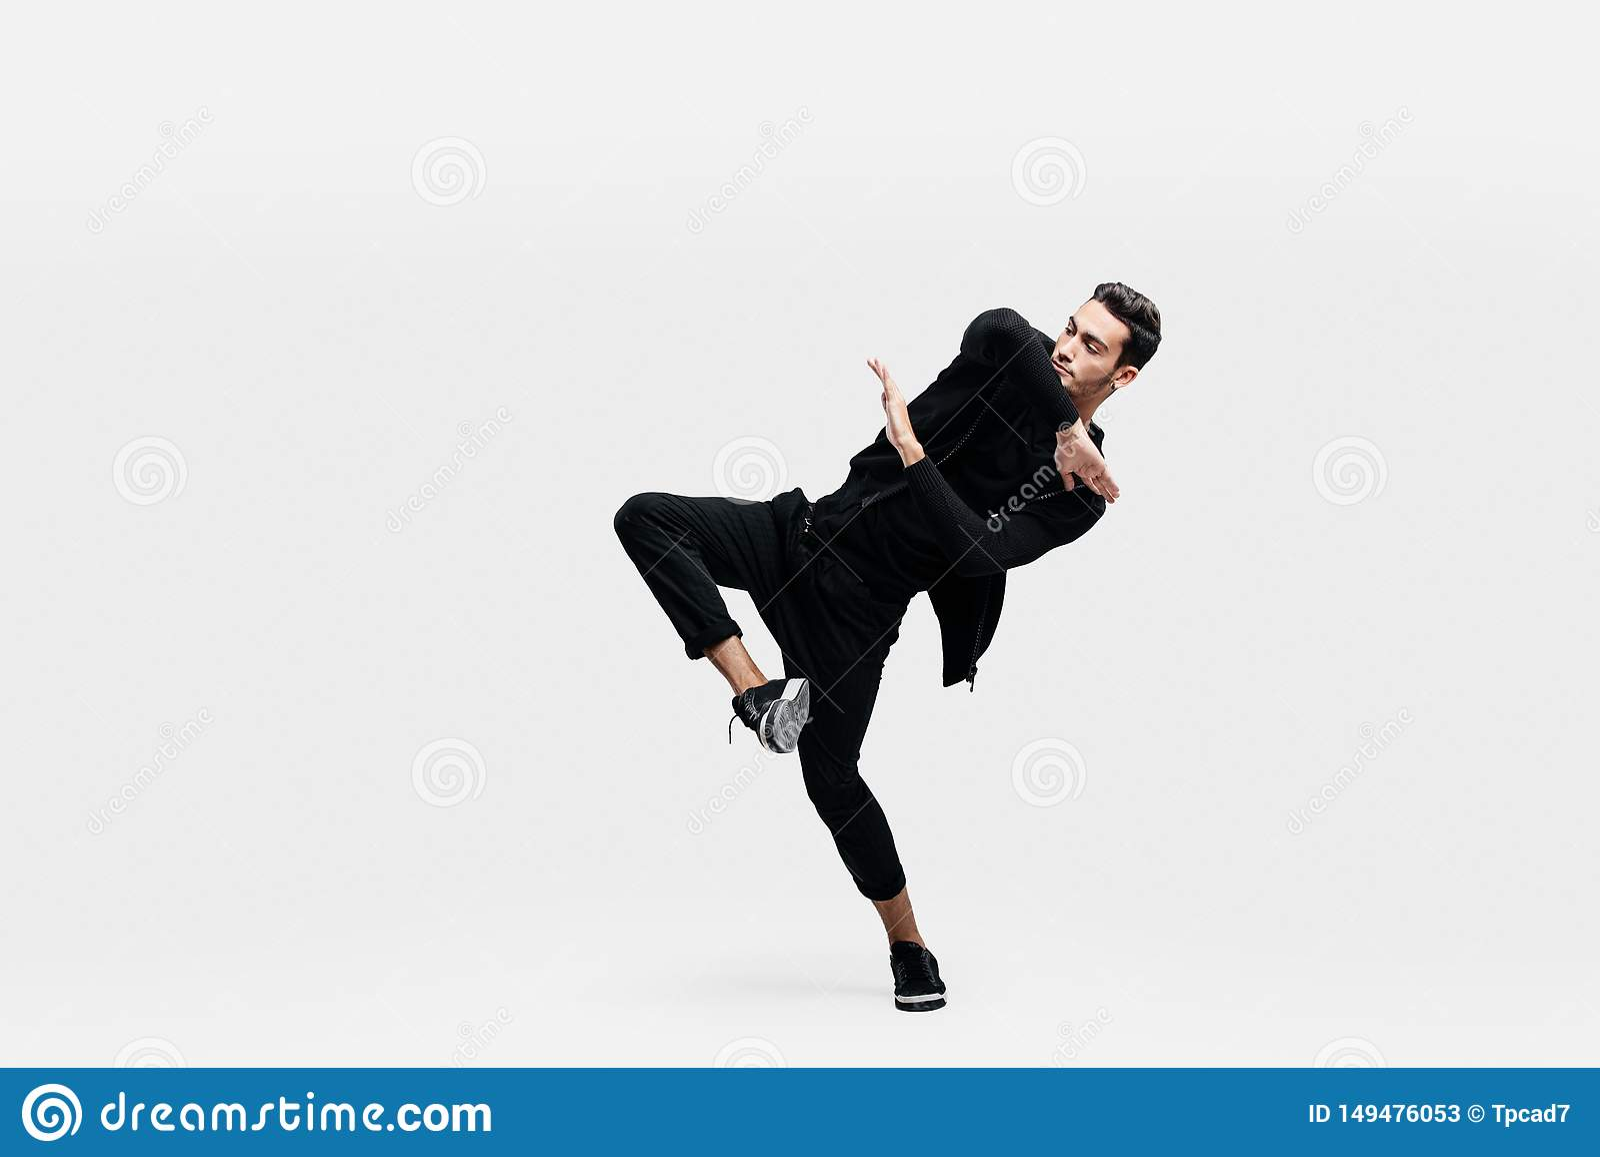 Stylish young man wearing a black sweatshirt and black pants makes stylized movements of hip-poh